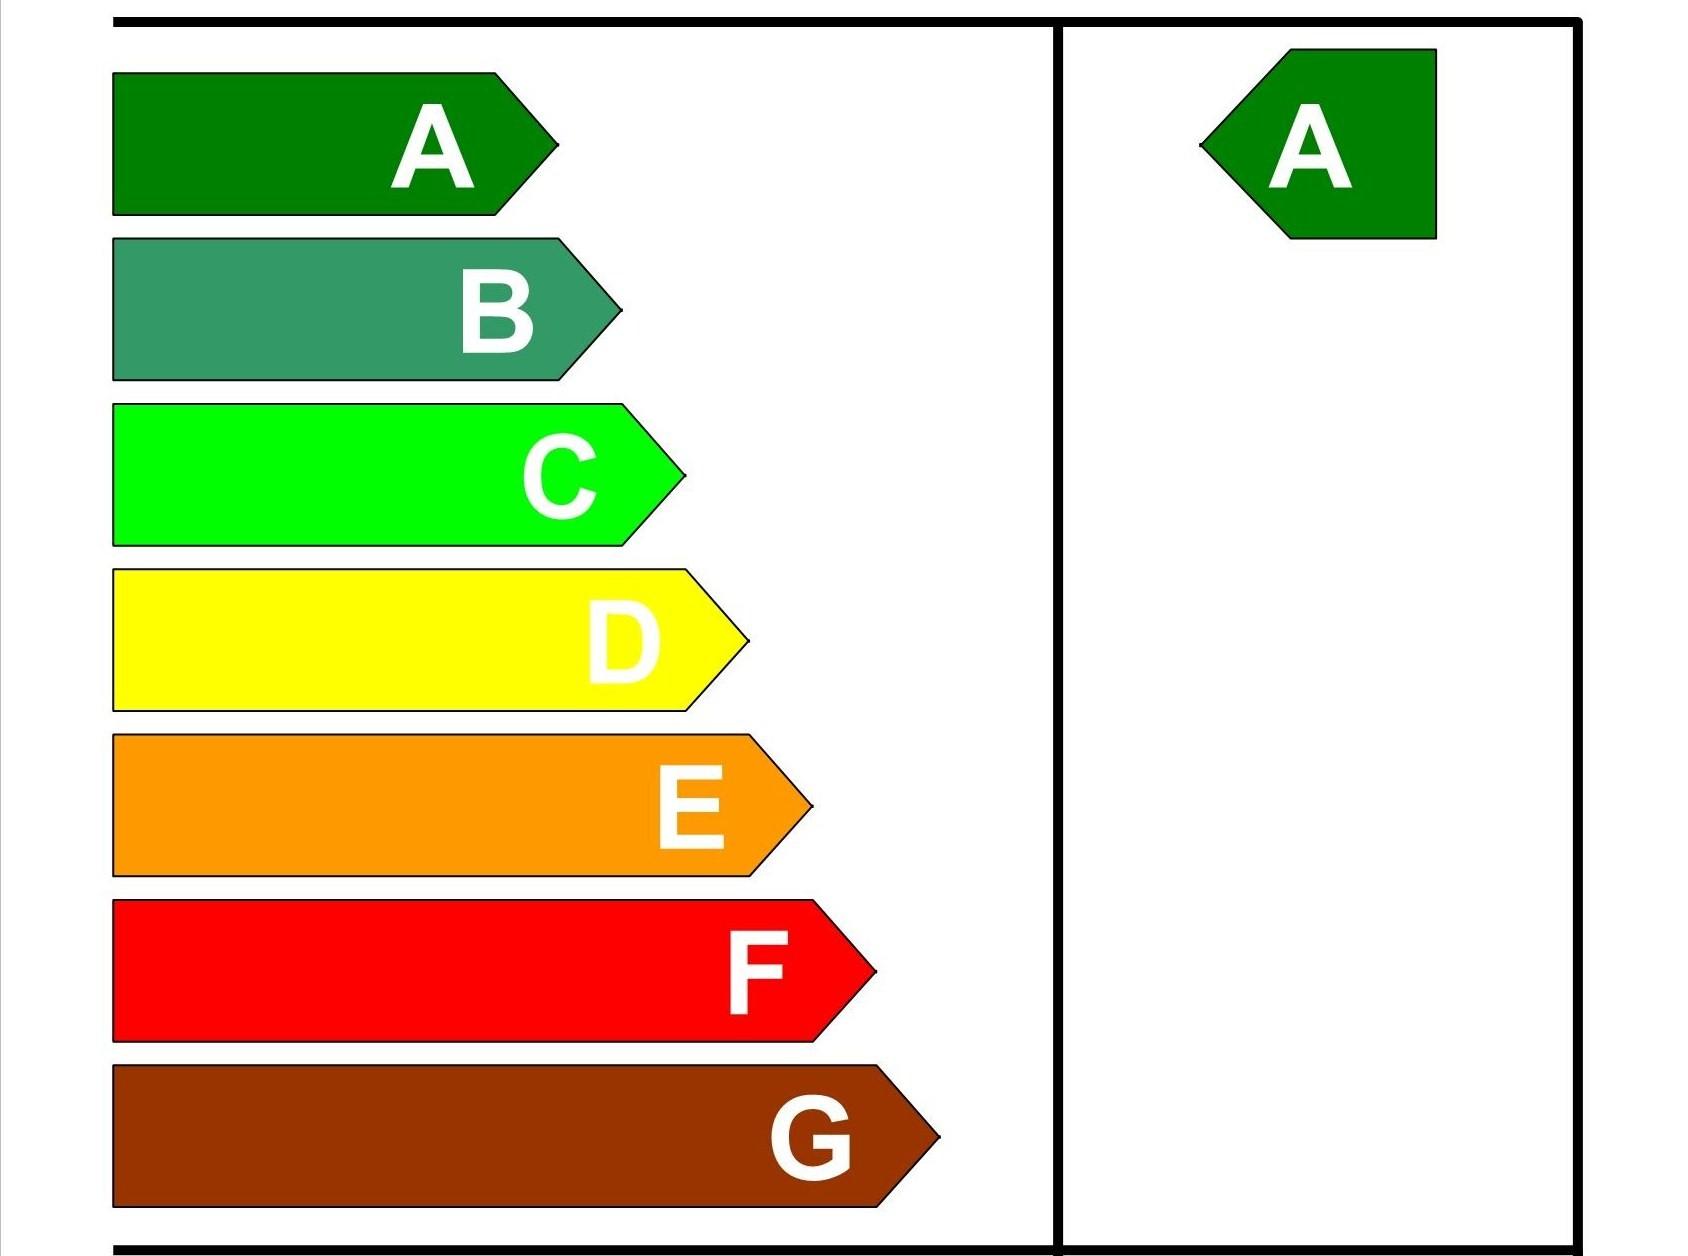 upvc window A rating